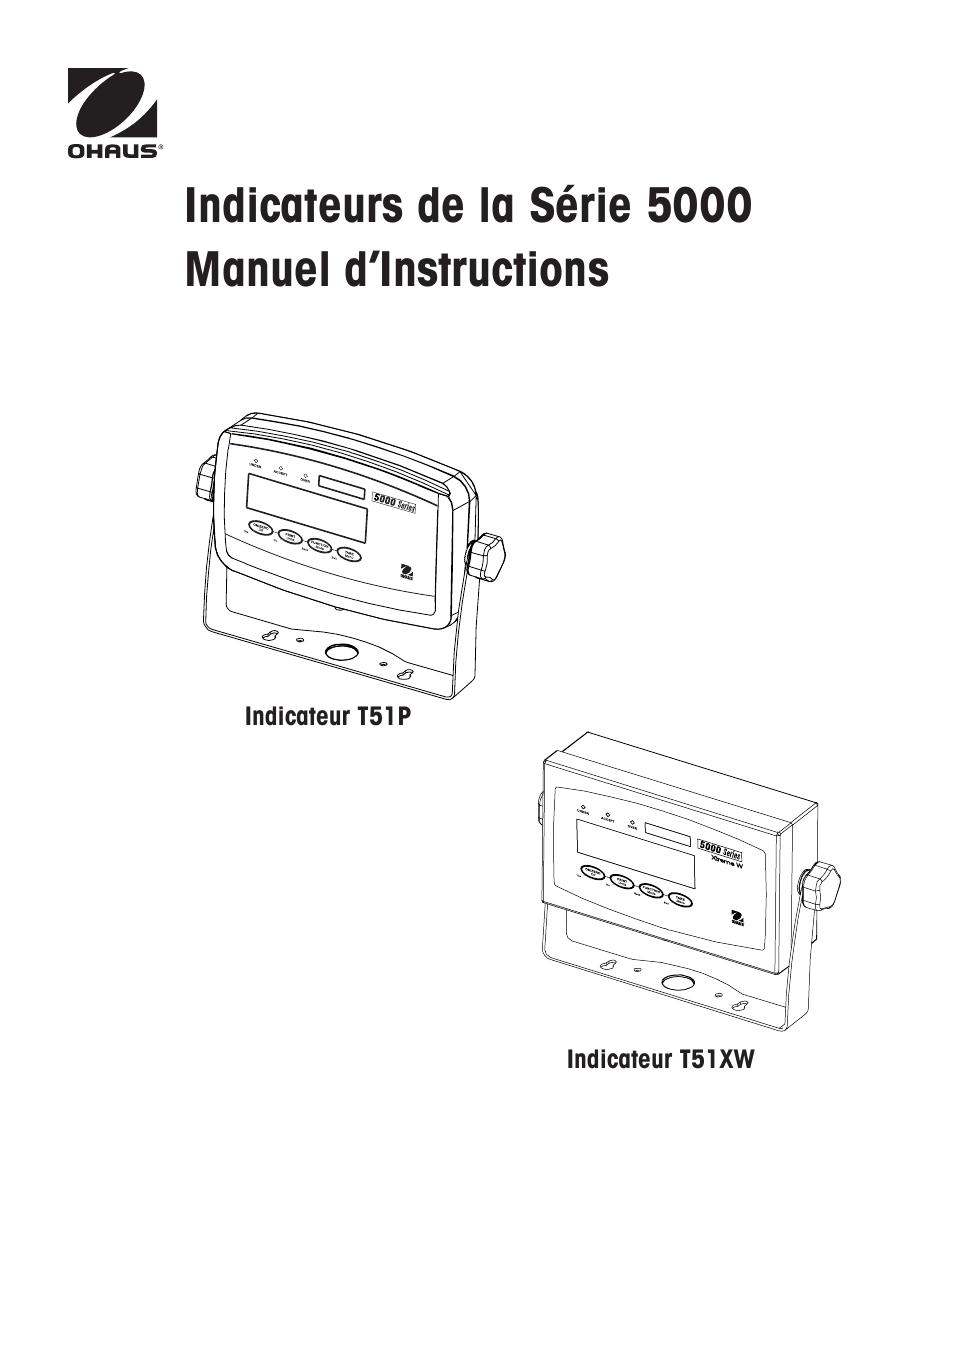 Ohaus DEFENDER 5000 BENCH SCALES Manual fr Manuel d